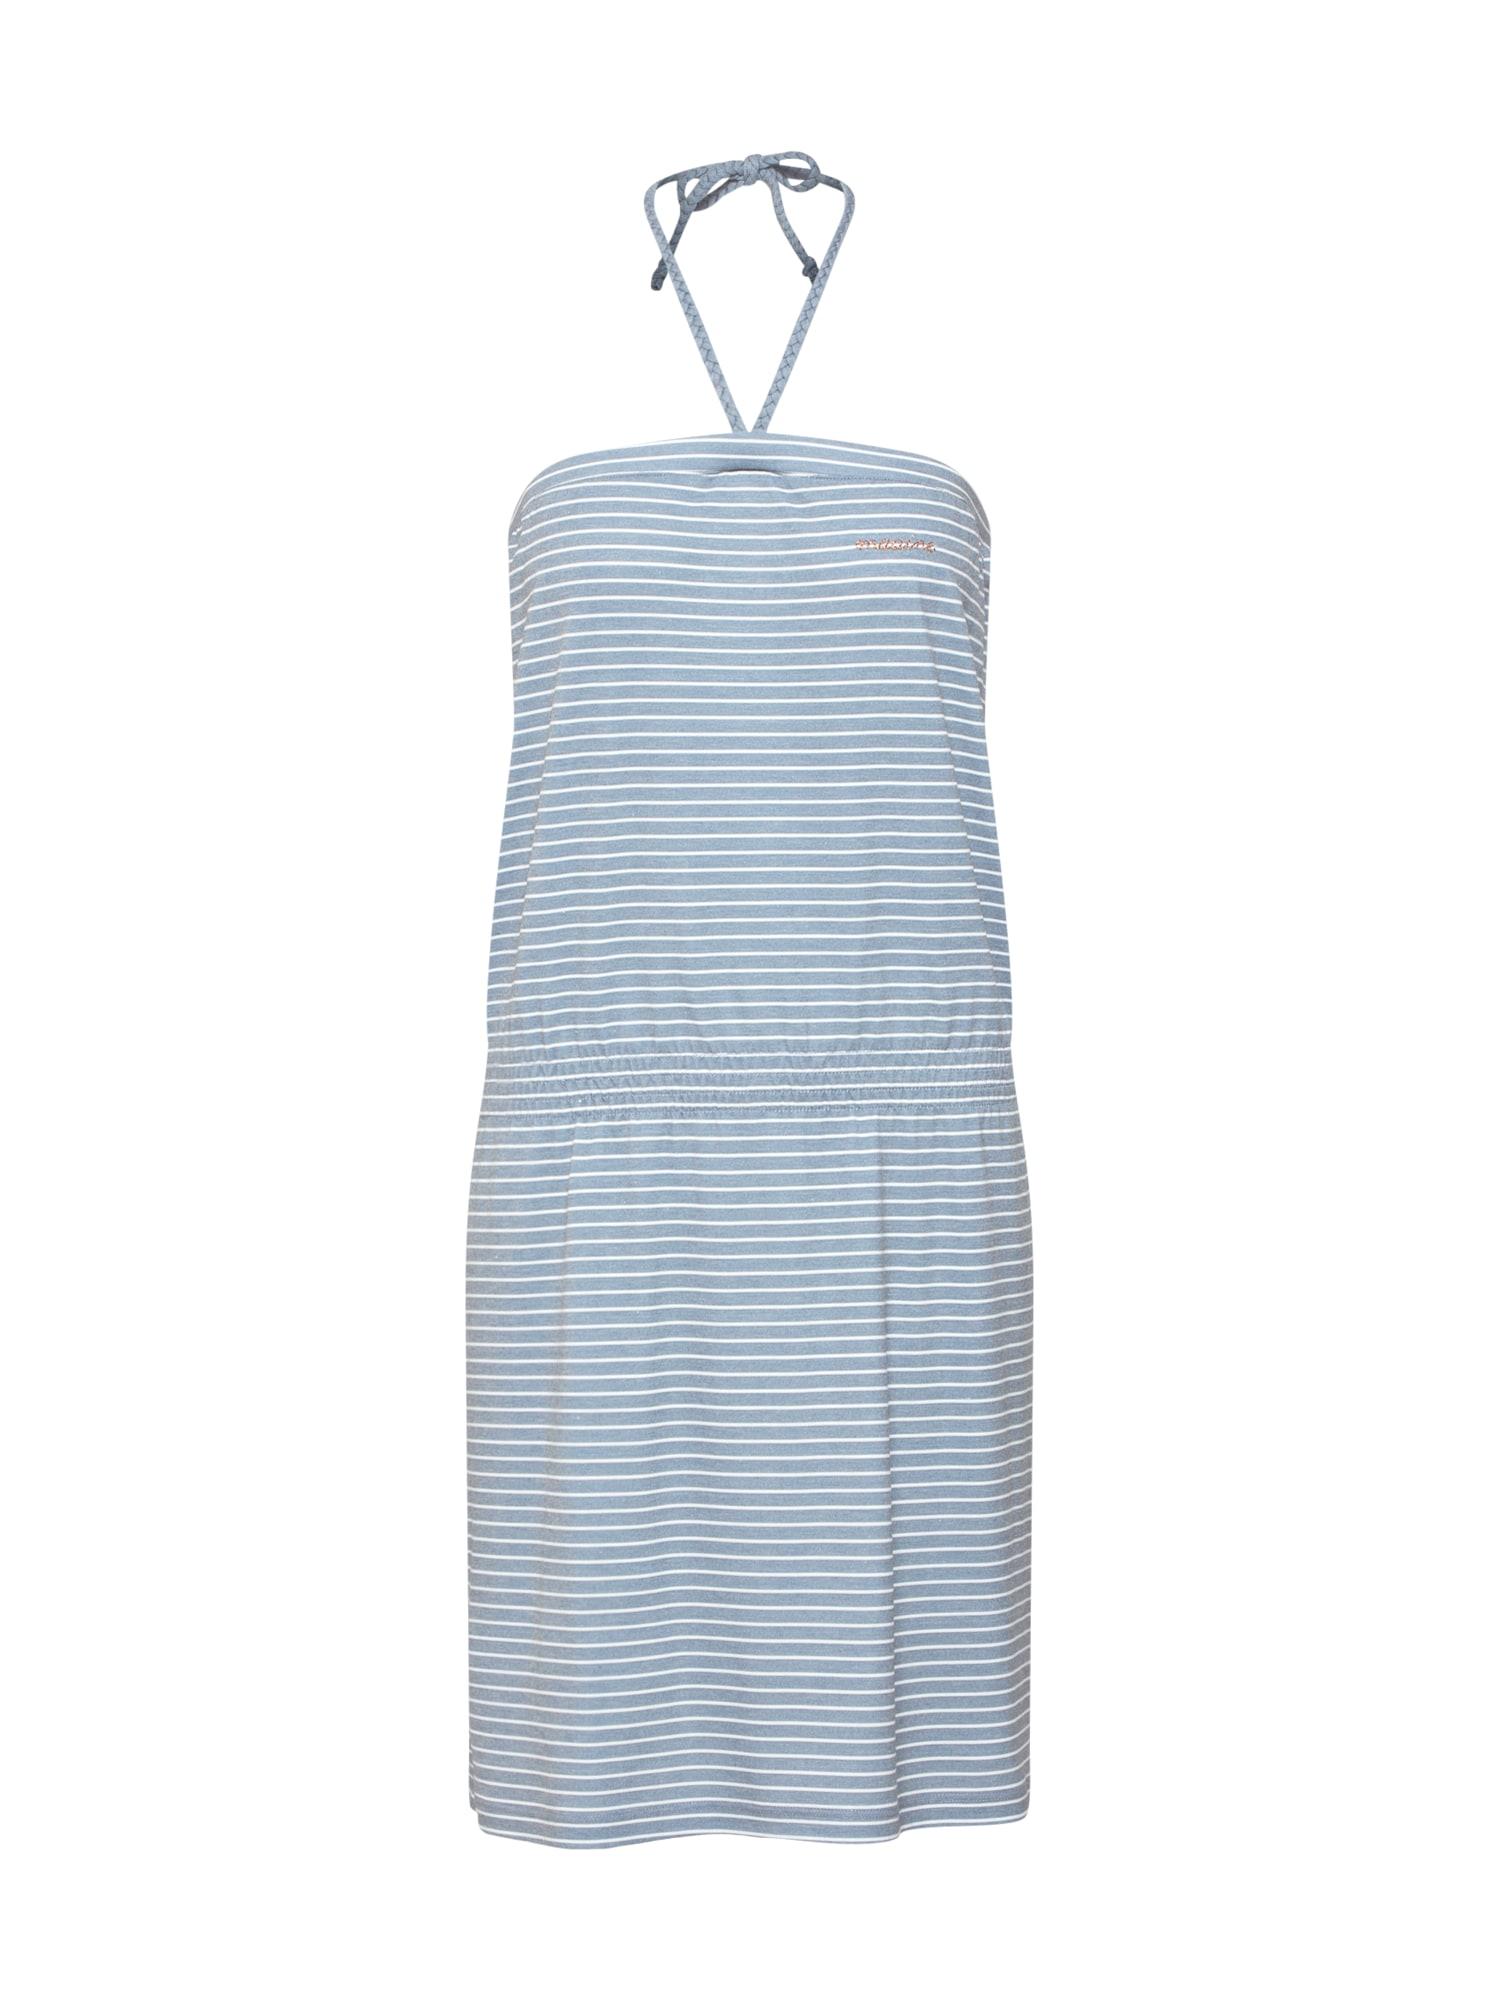 Šaty námořnická modř bílá Mazine